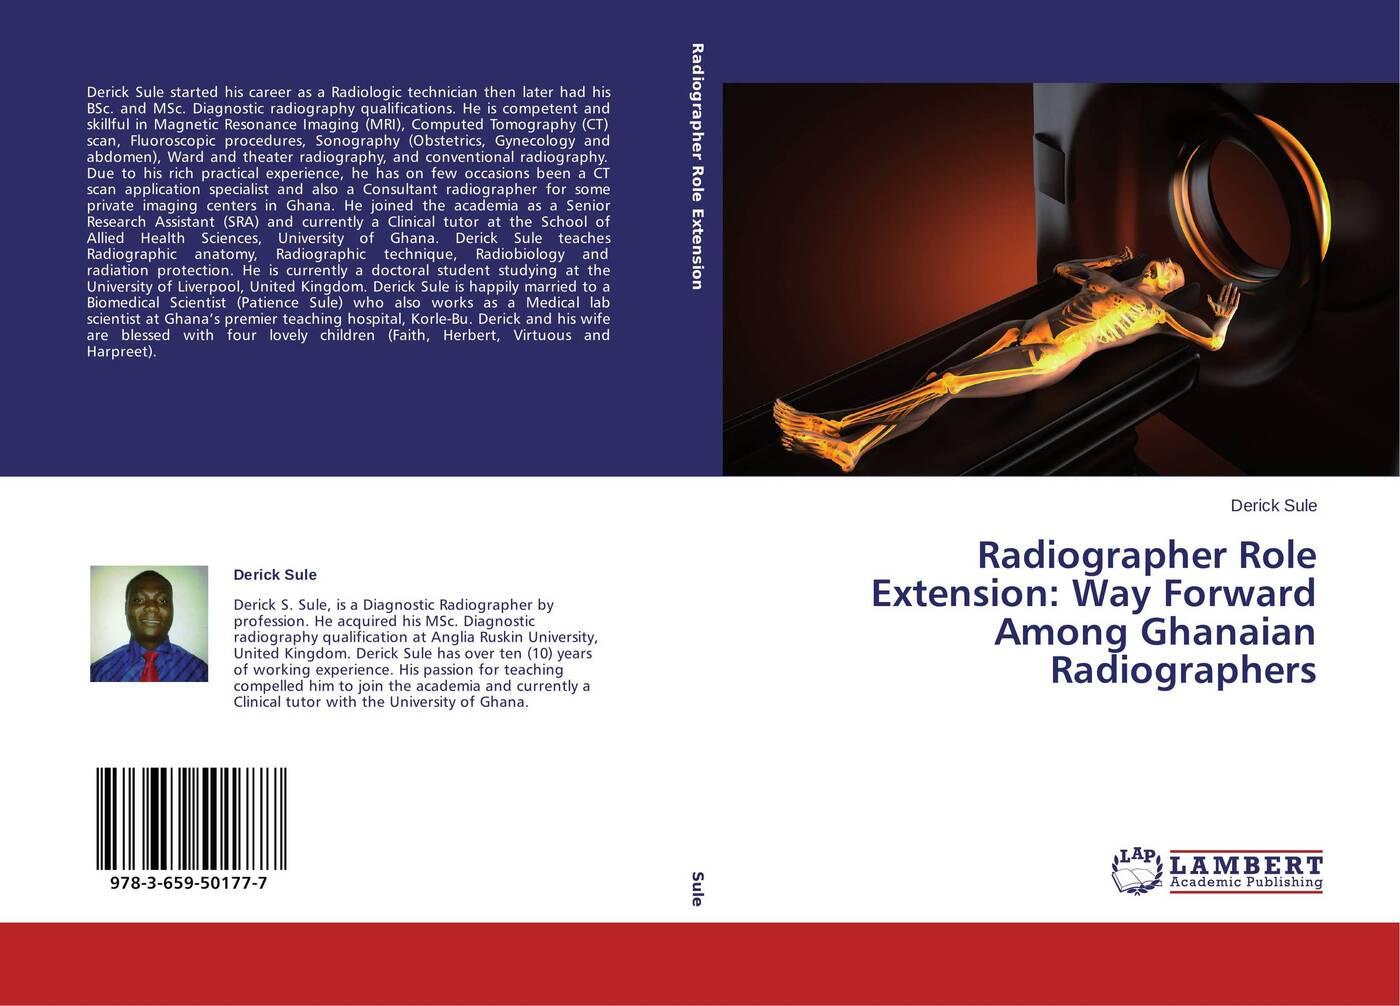 купить Derick Sule Radiographer Role Extension: Way Forward Among Ghanaian Radiographers по цене 5707 рублей